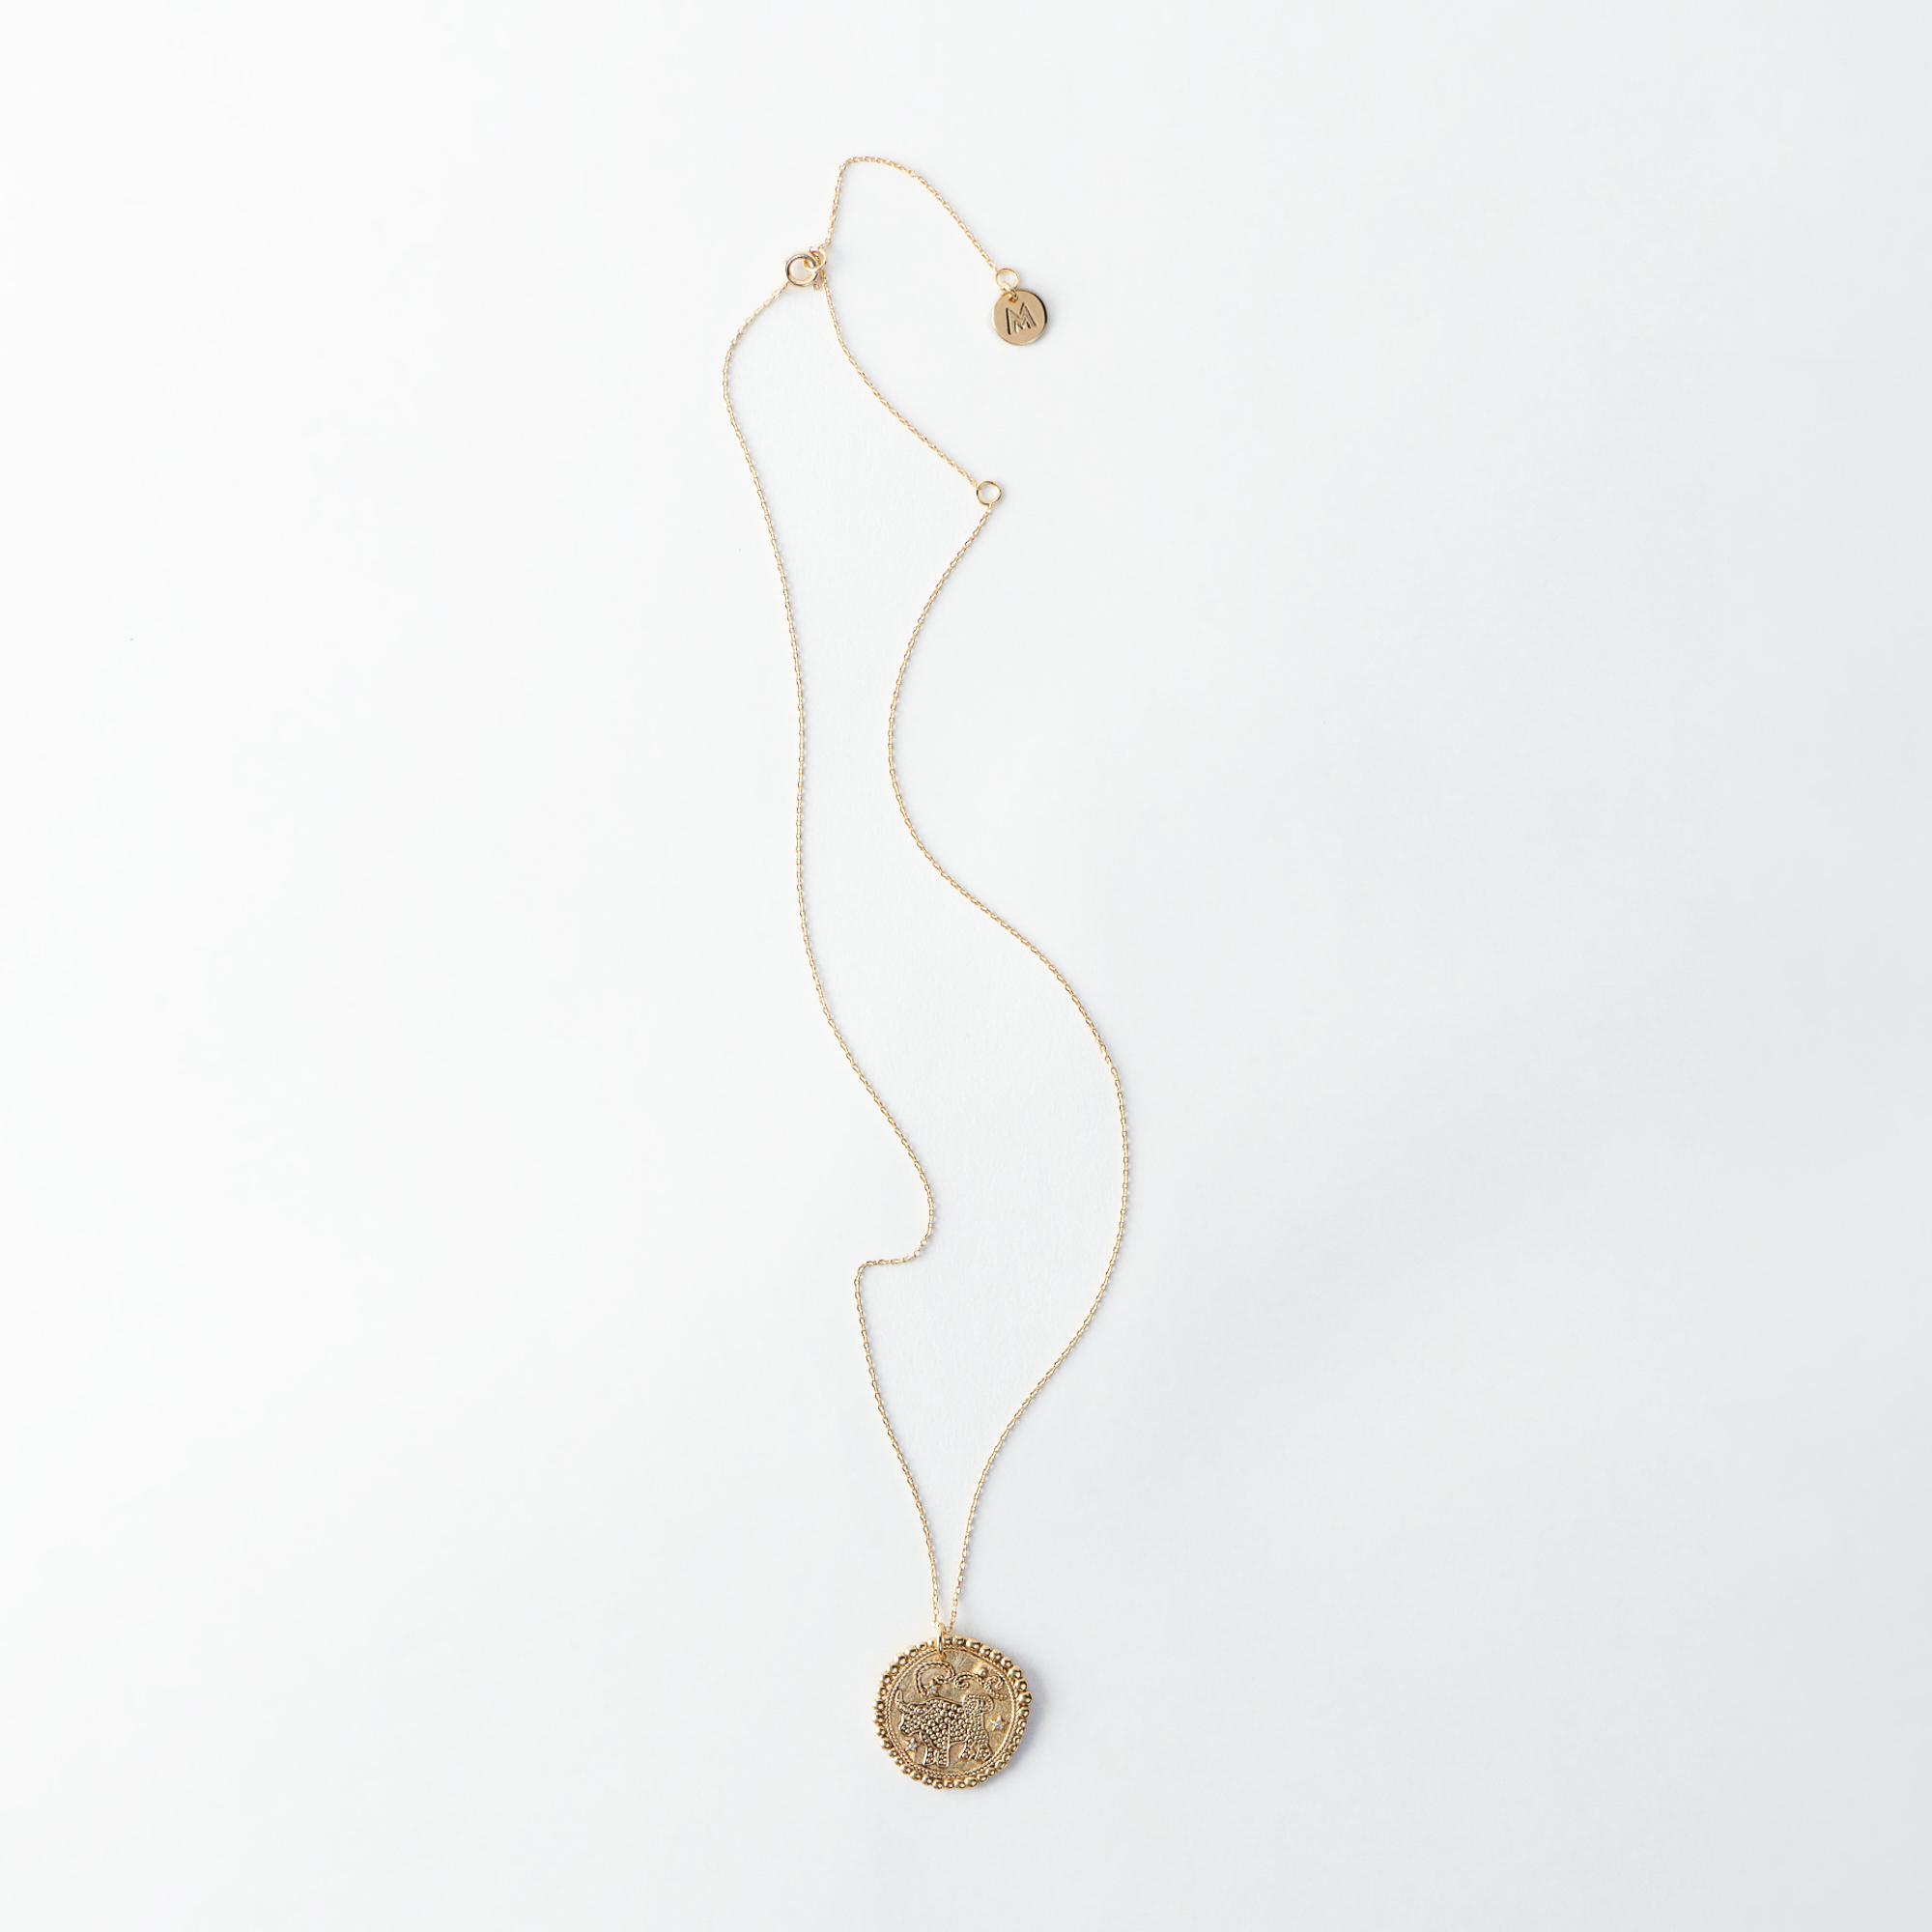 Taurus Zodiac Necklace - Gold